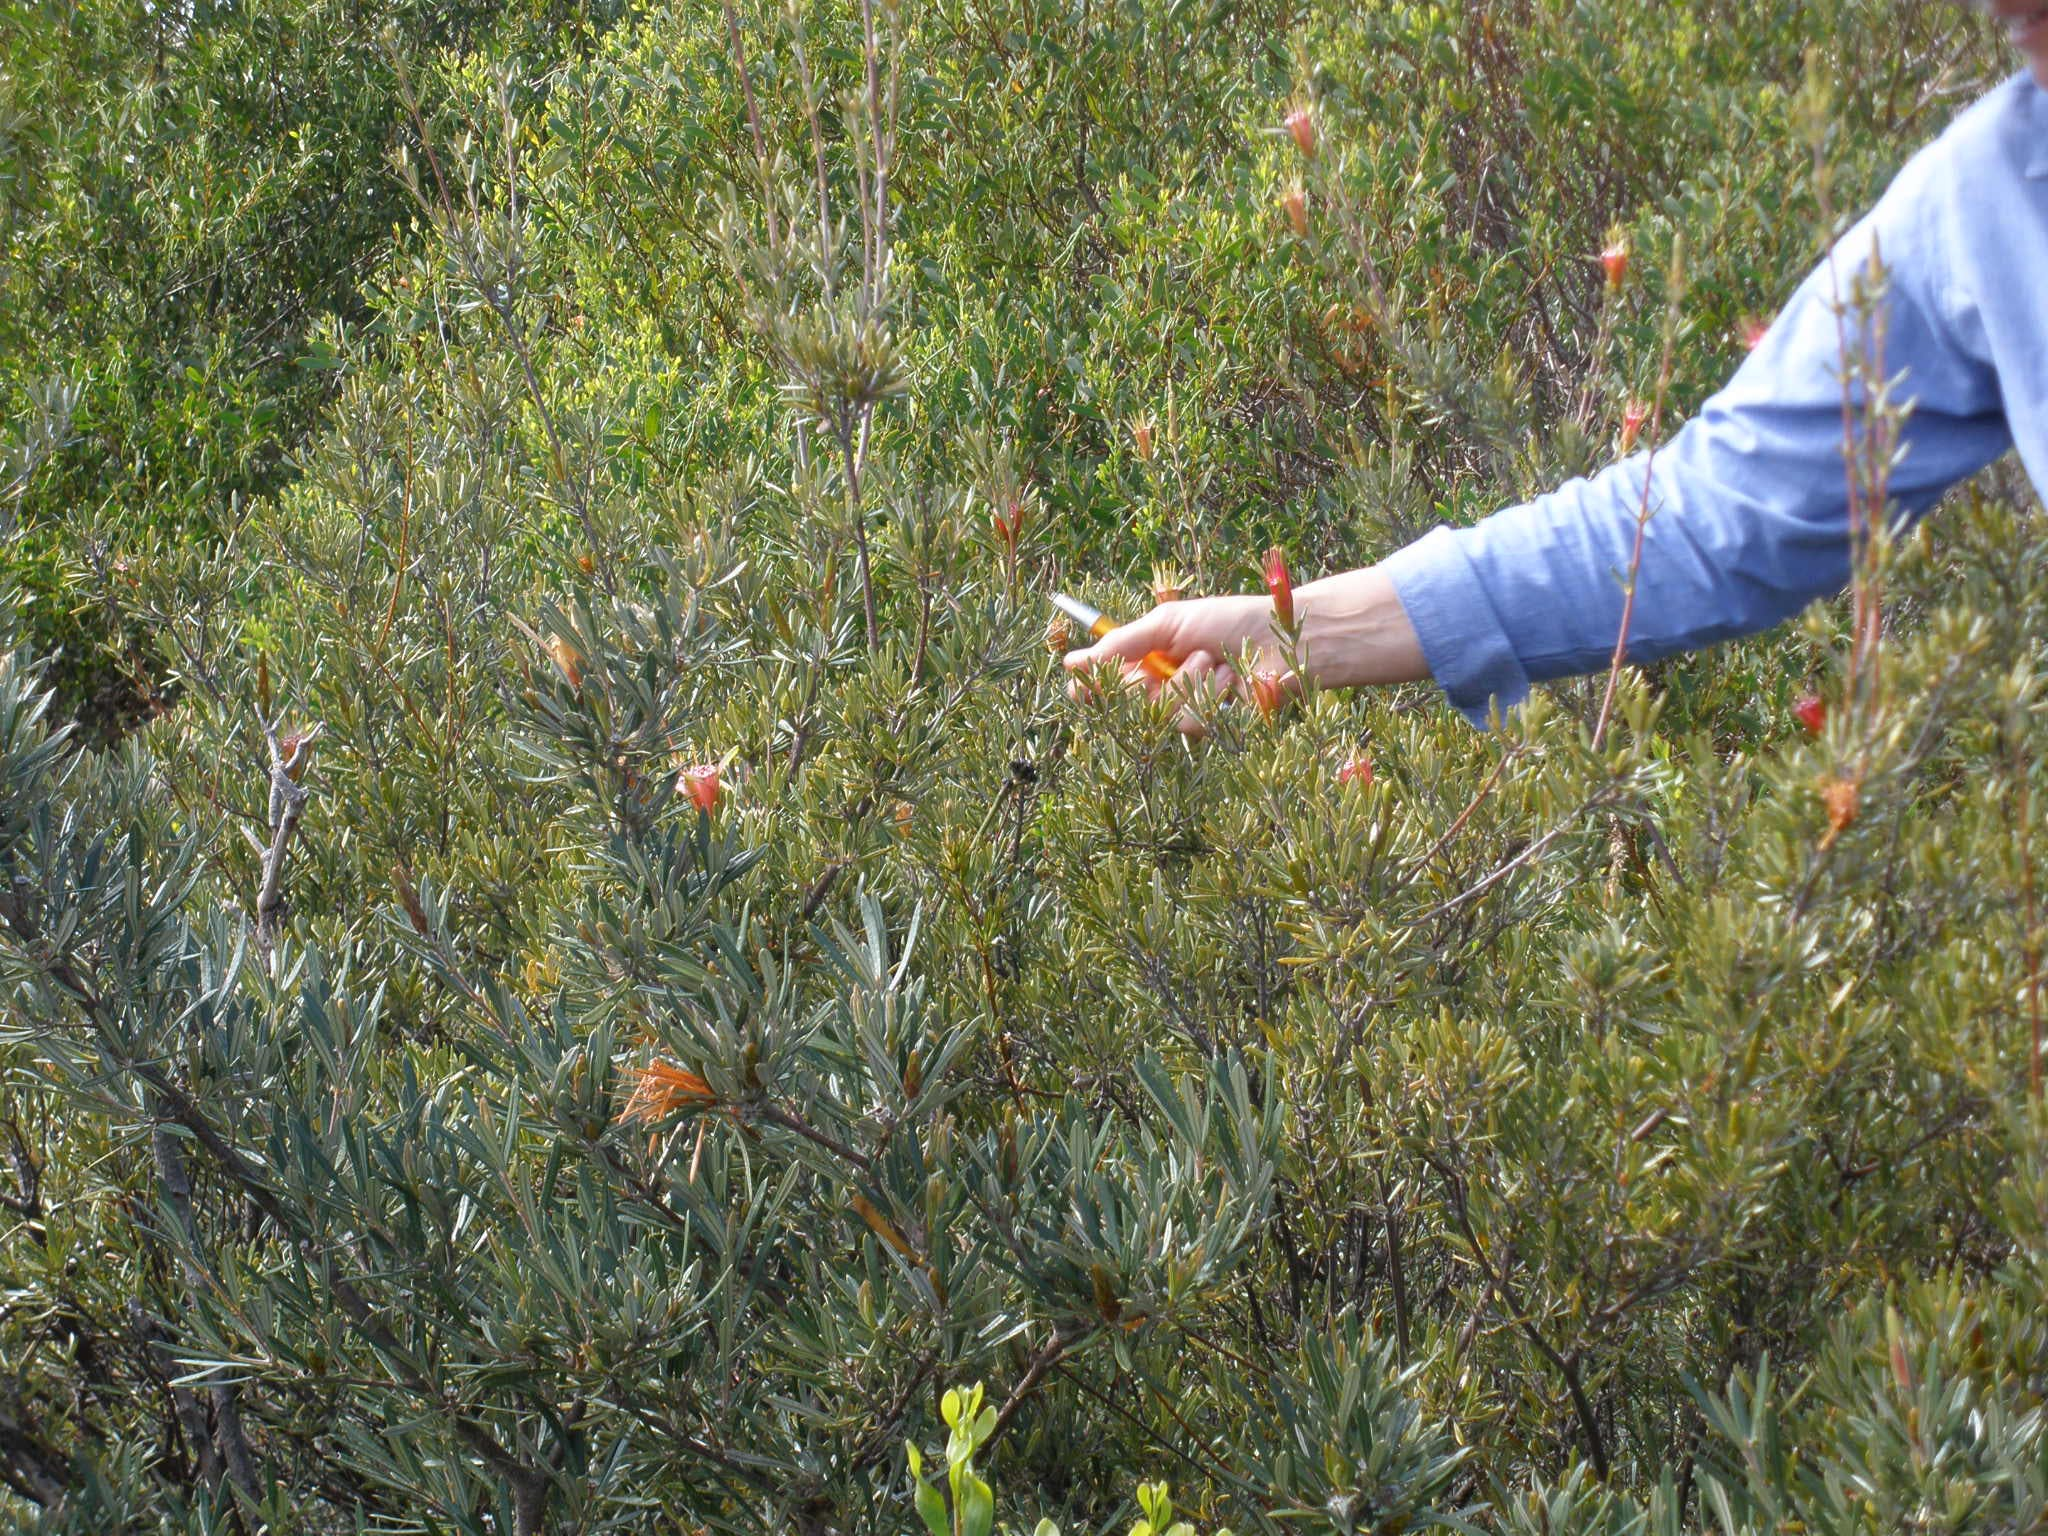 Eastern Suburbs Banksia Scrub